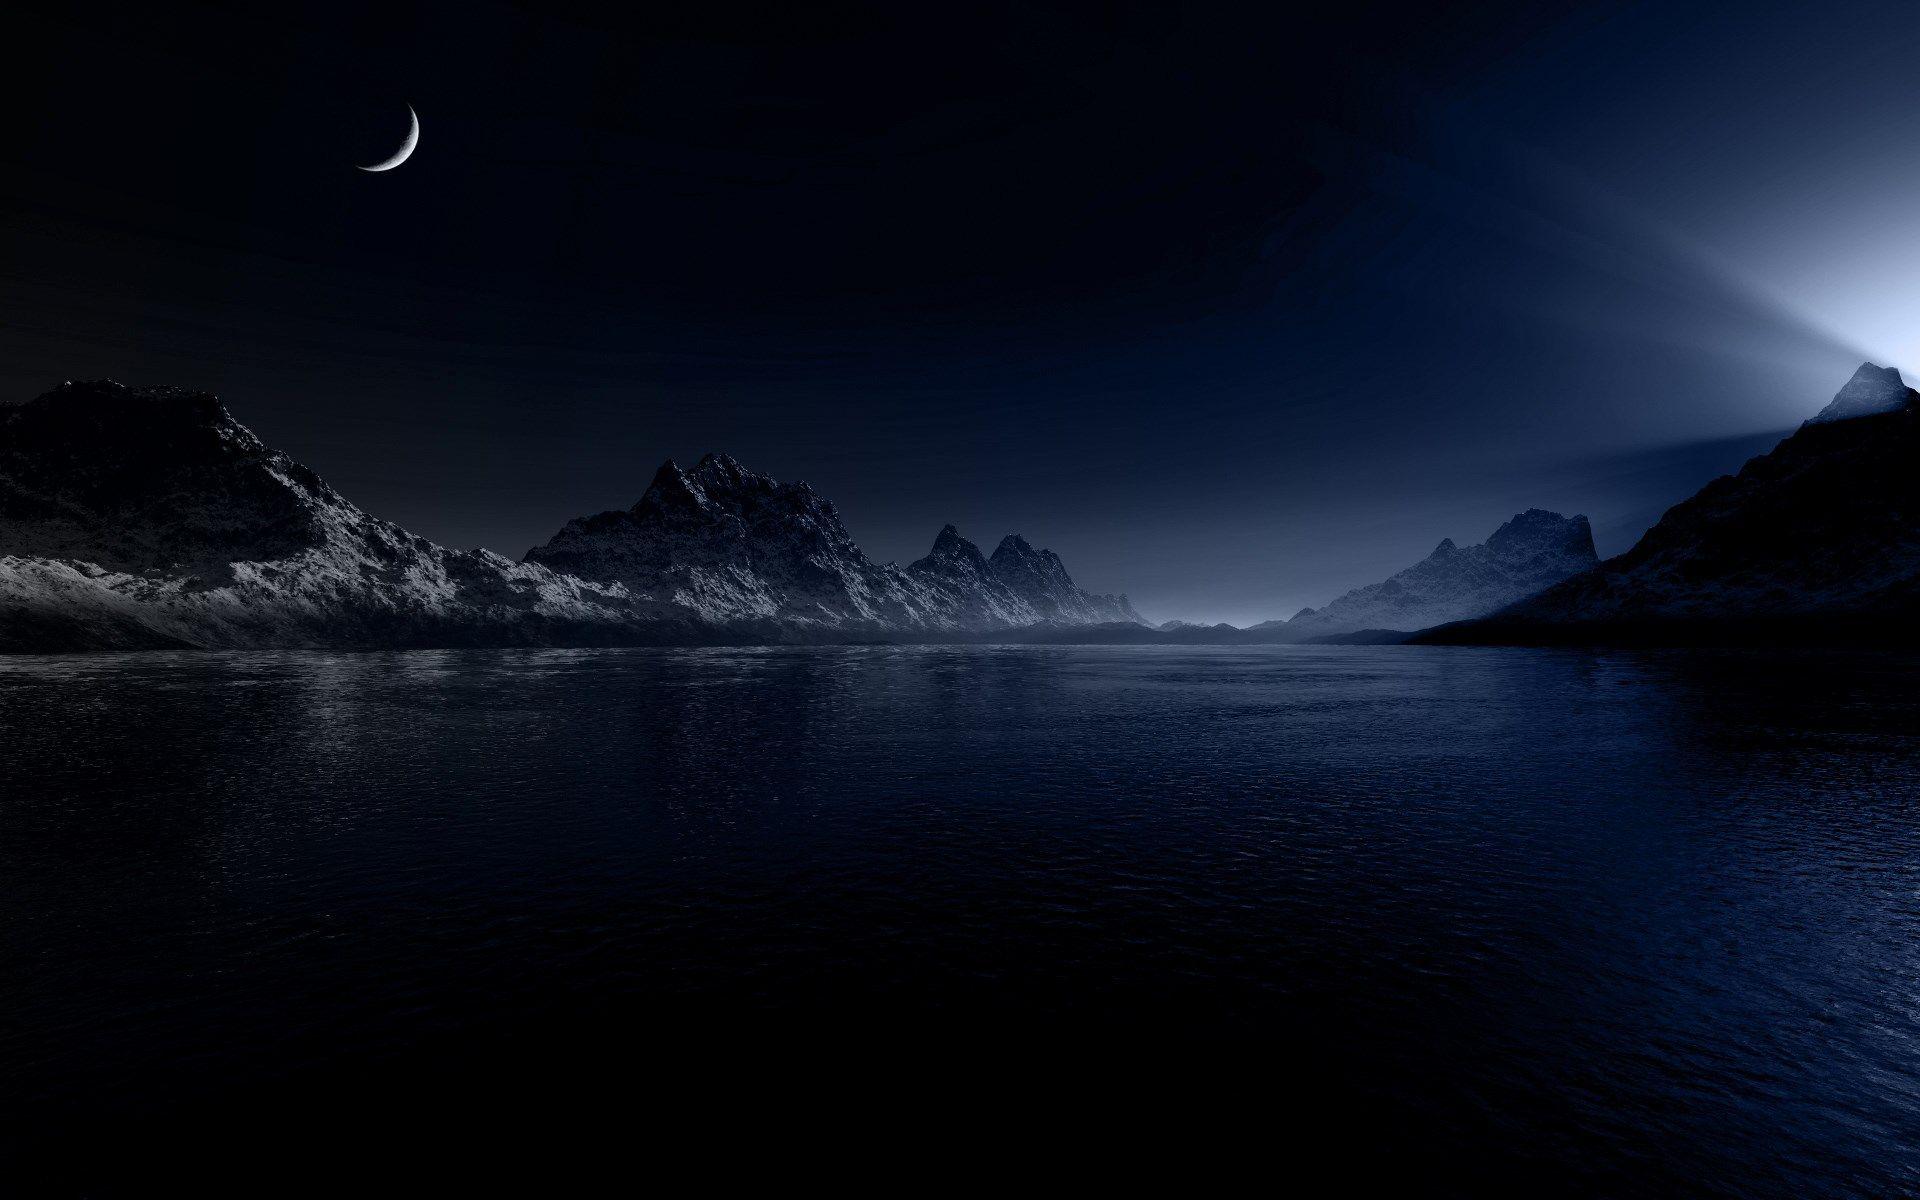 Night Sky Free Desktop Backgrounds For Winter Dark Landscape Landscape Wallpaper Night Landscape